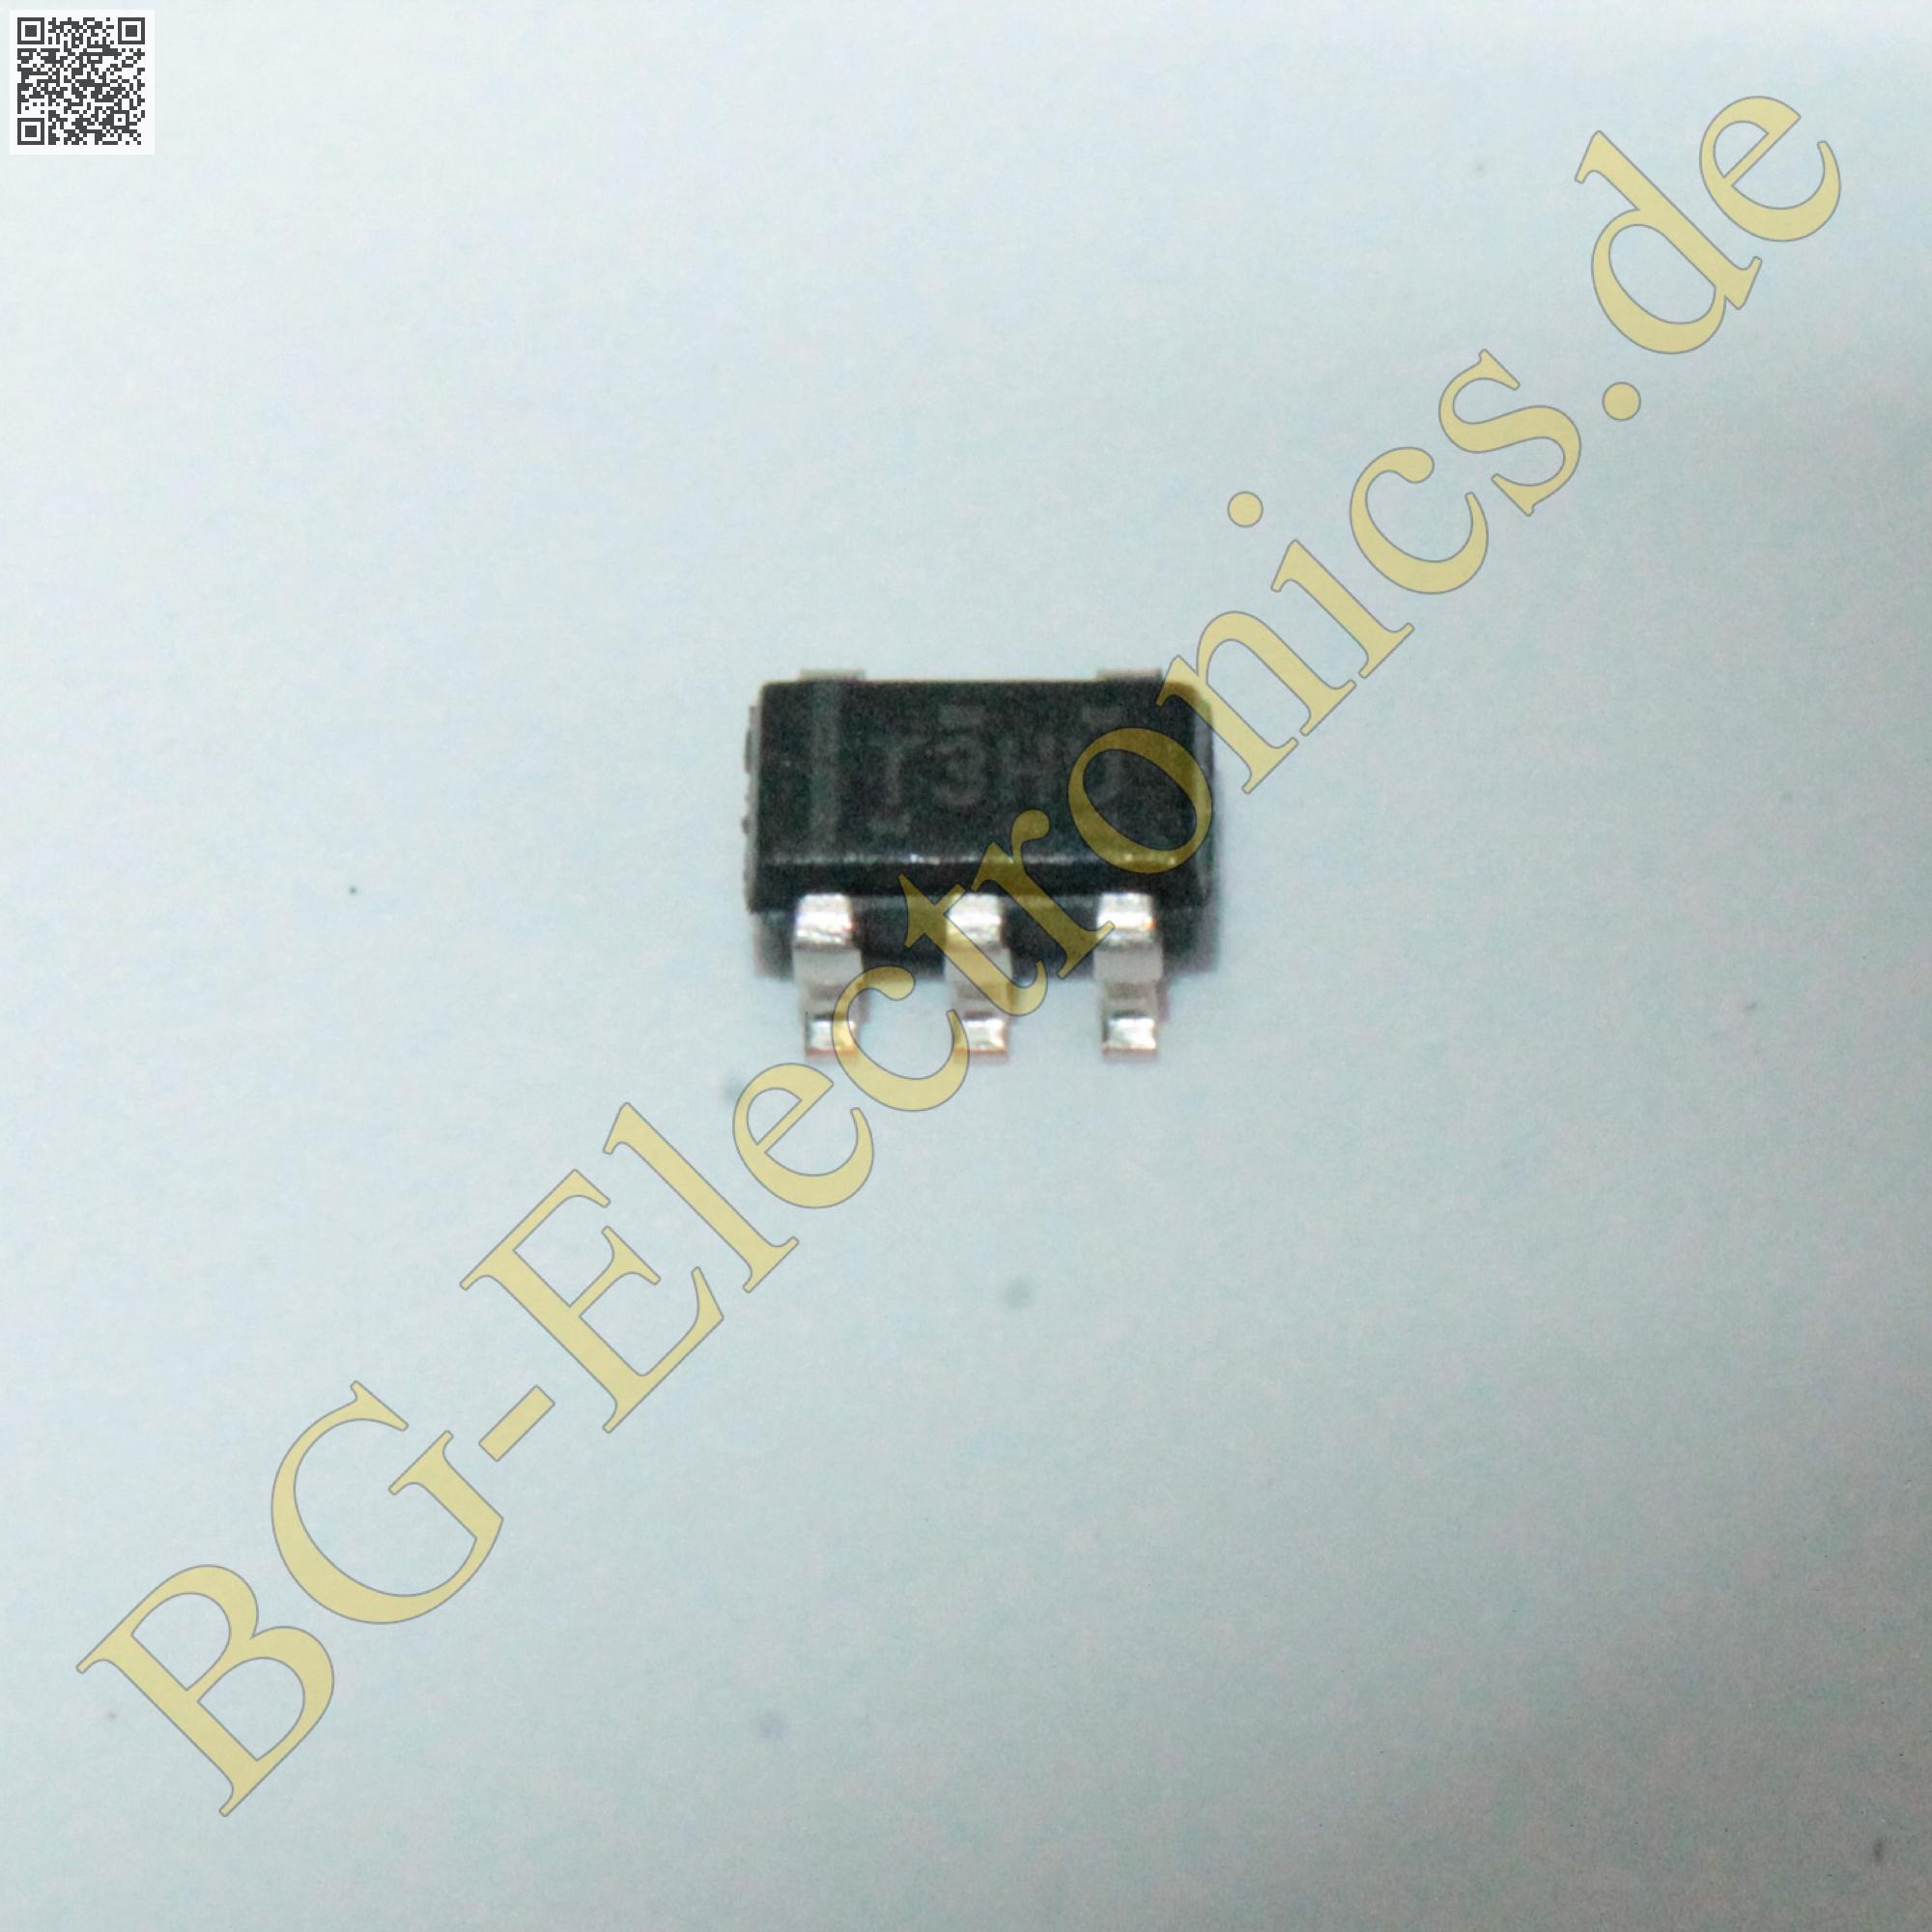 Tl431bqdbvt Bg Electronics Tl431bqdbv Tl431bqdb Adjustable Regulator By Tl431 Precision Shunt Regulators